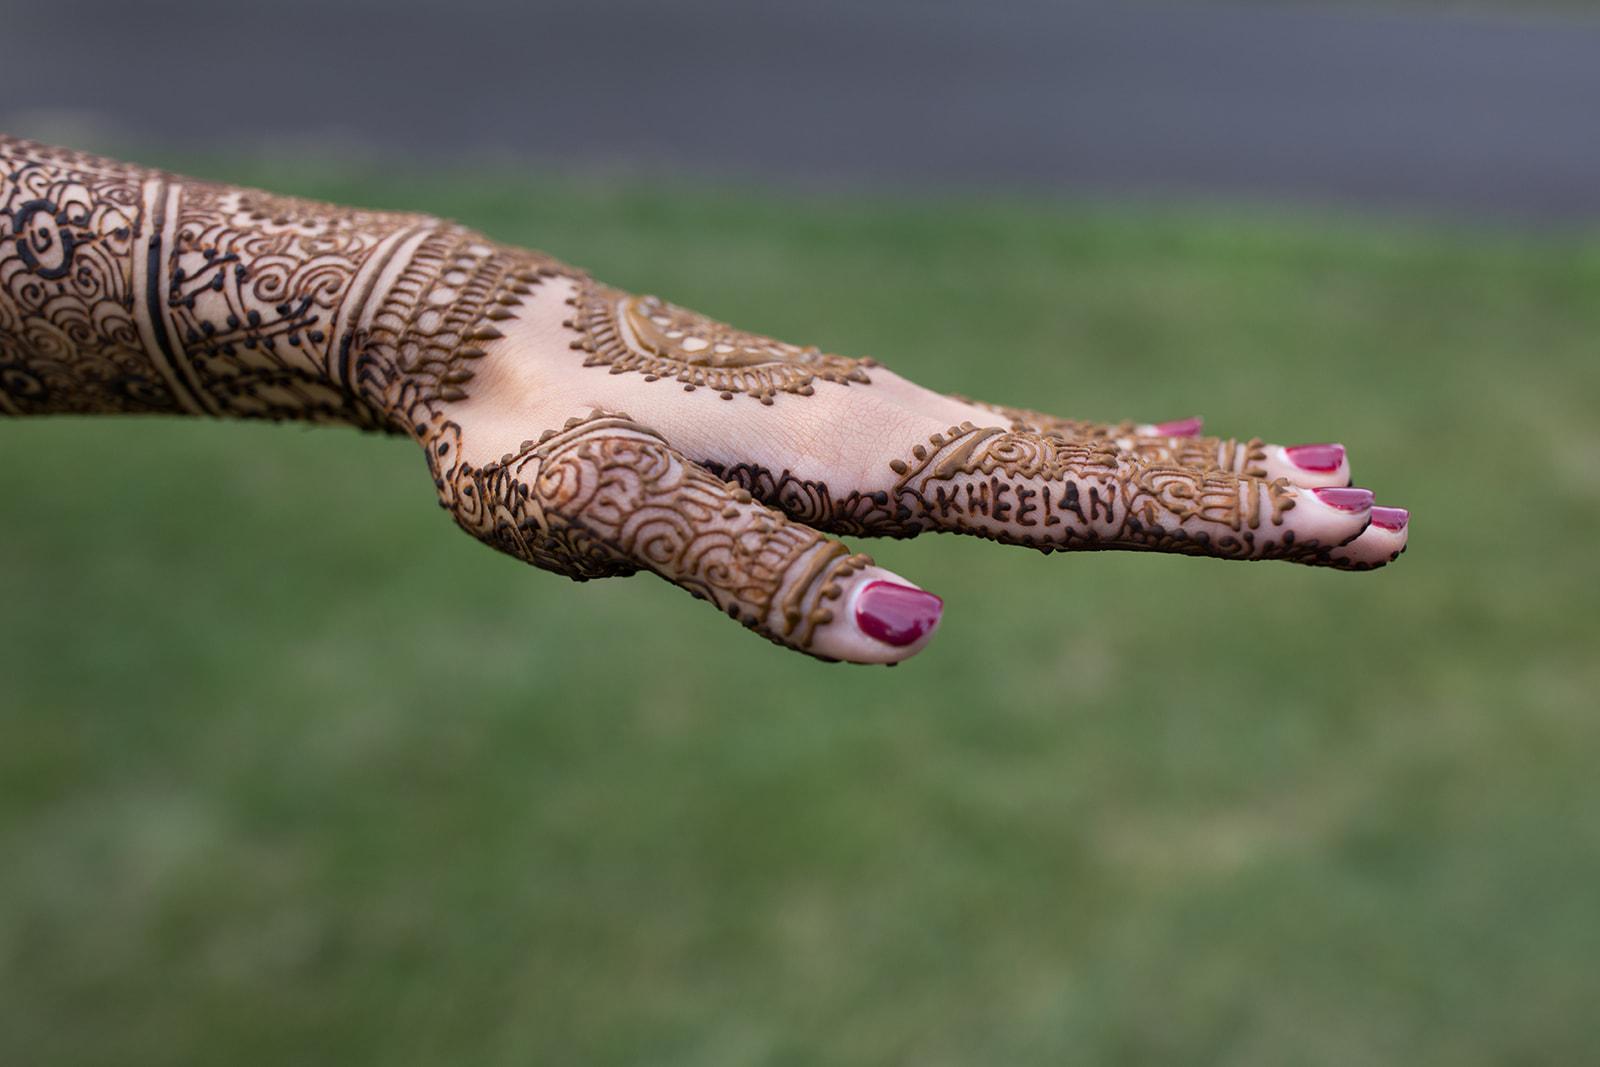 Le Cape Weddings - Puja and Kheelan - Mendhi A   -31.jpg